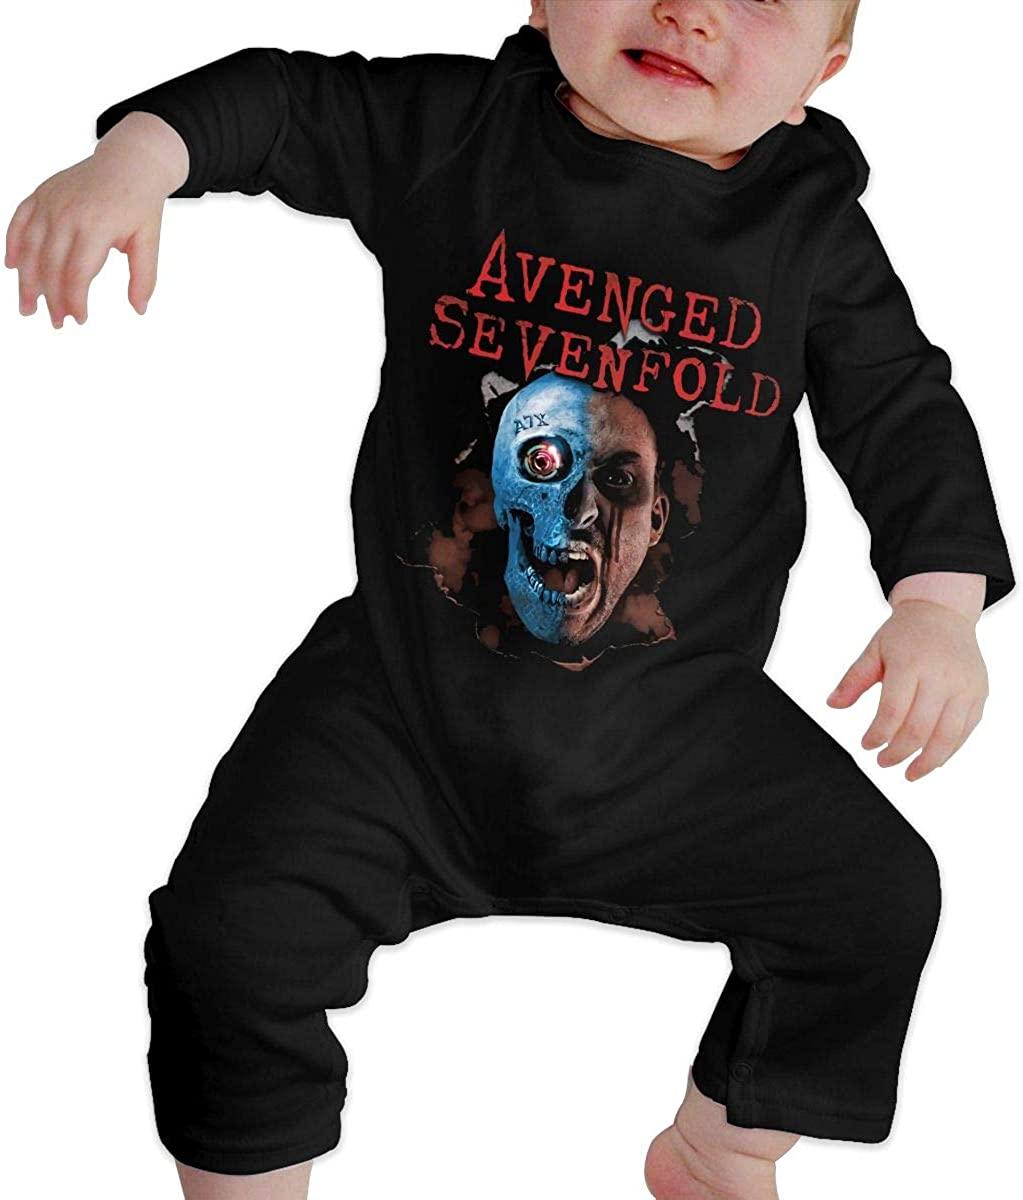 Watkinsmarket Avenged Sevenfold Baby Boy Girl Jumpsuit Jumpsuit Baby Newborn Cotton Long Sleeve Jumpsuit Black